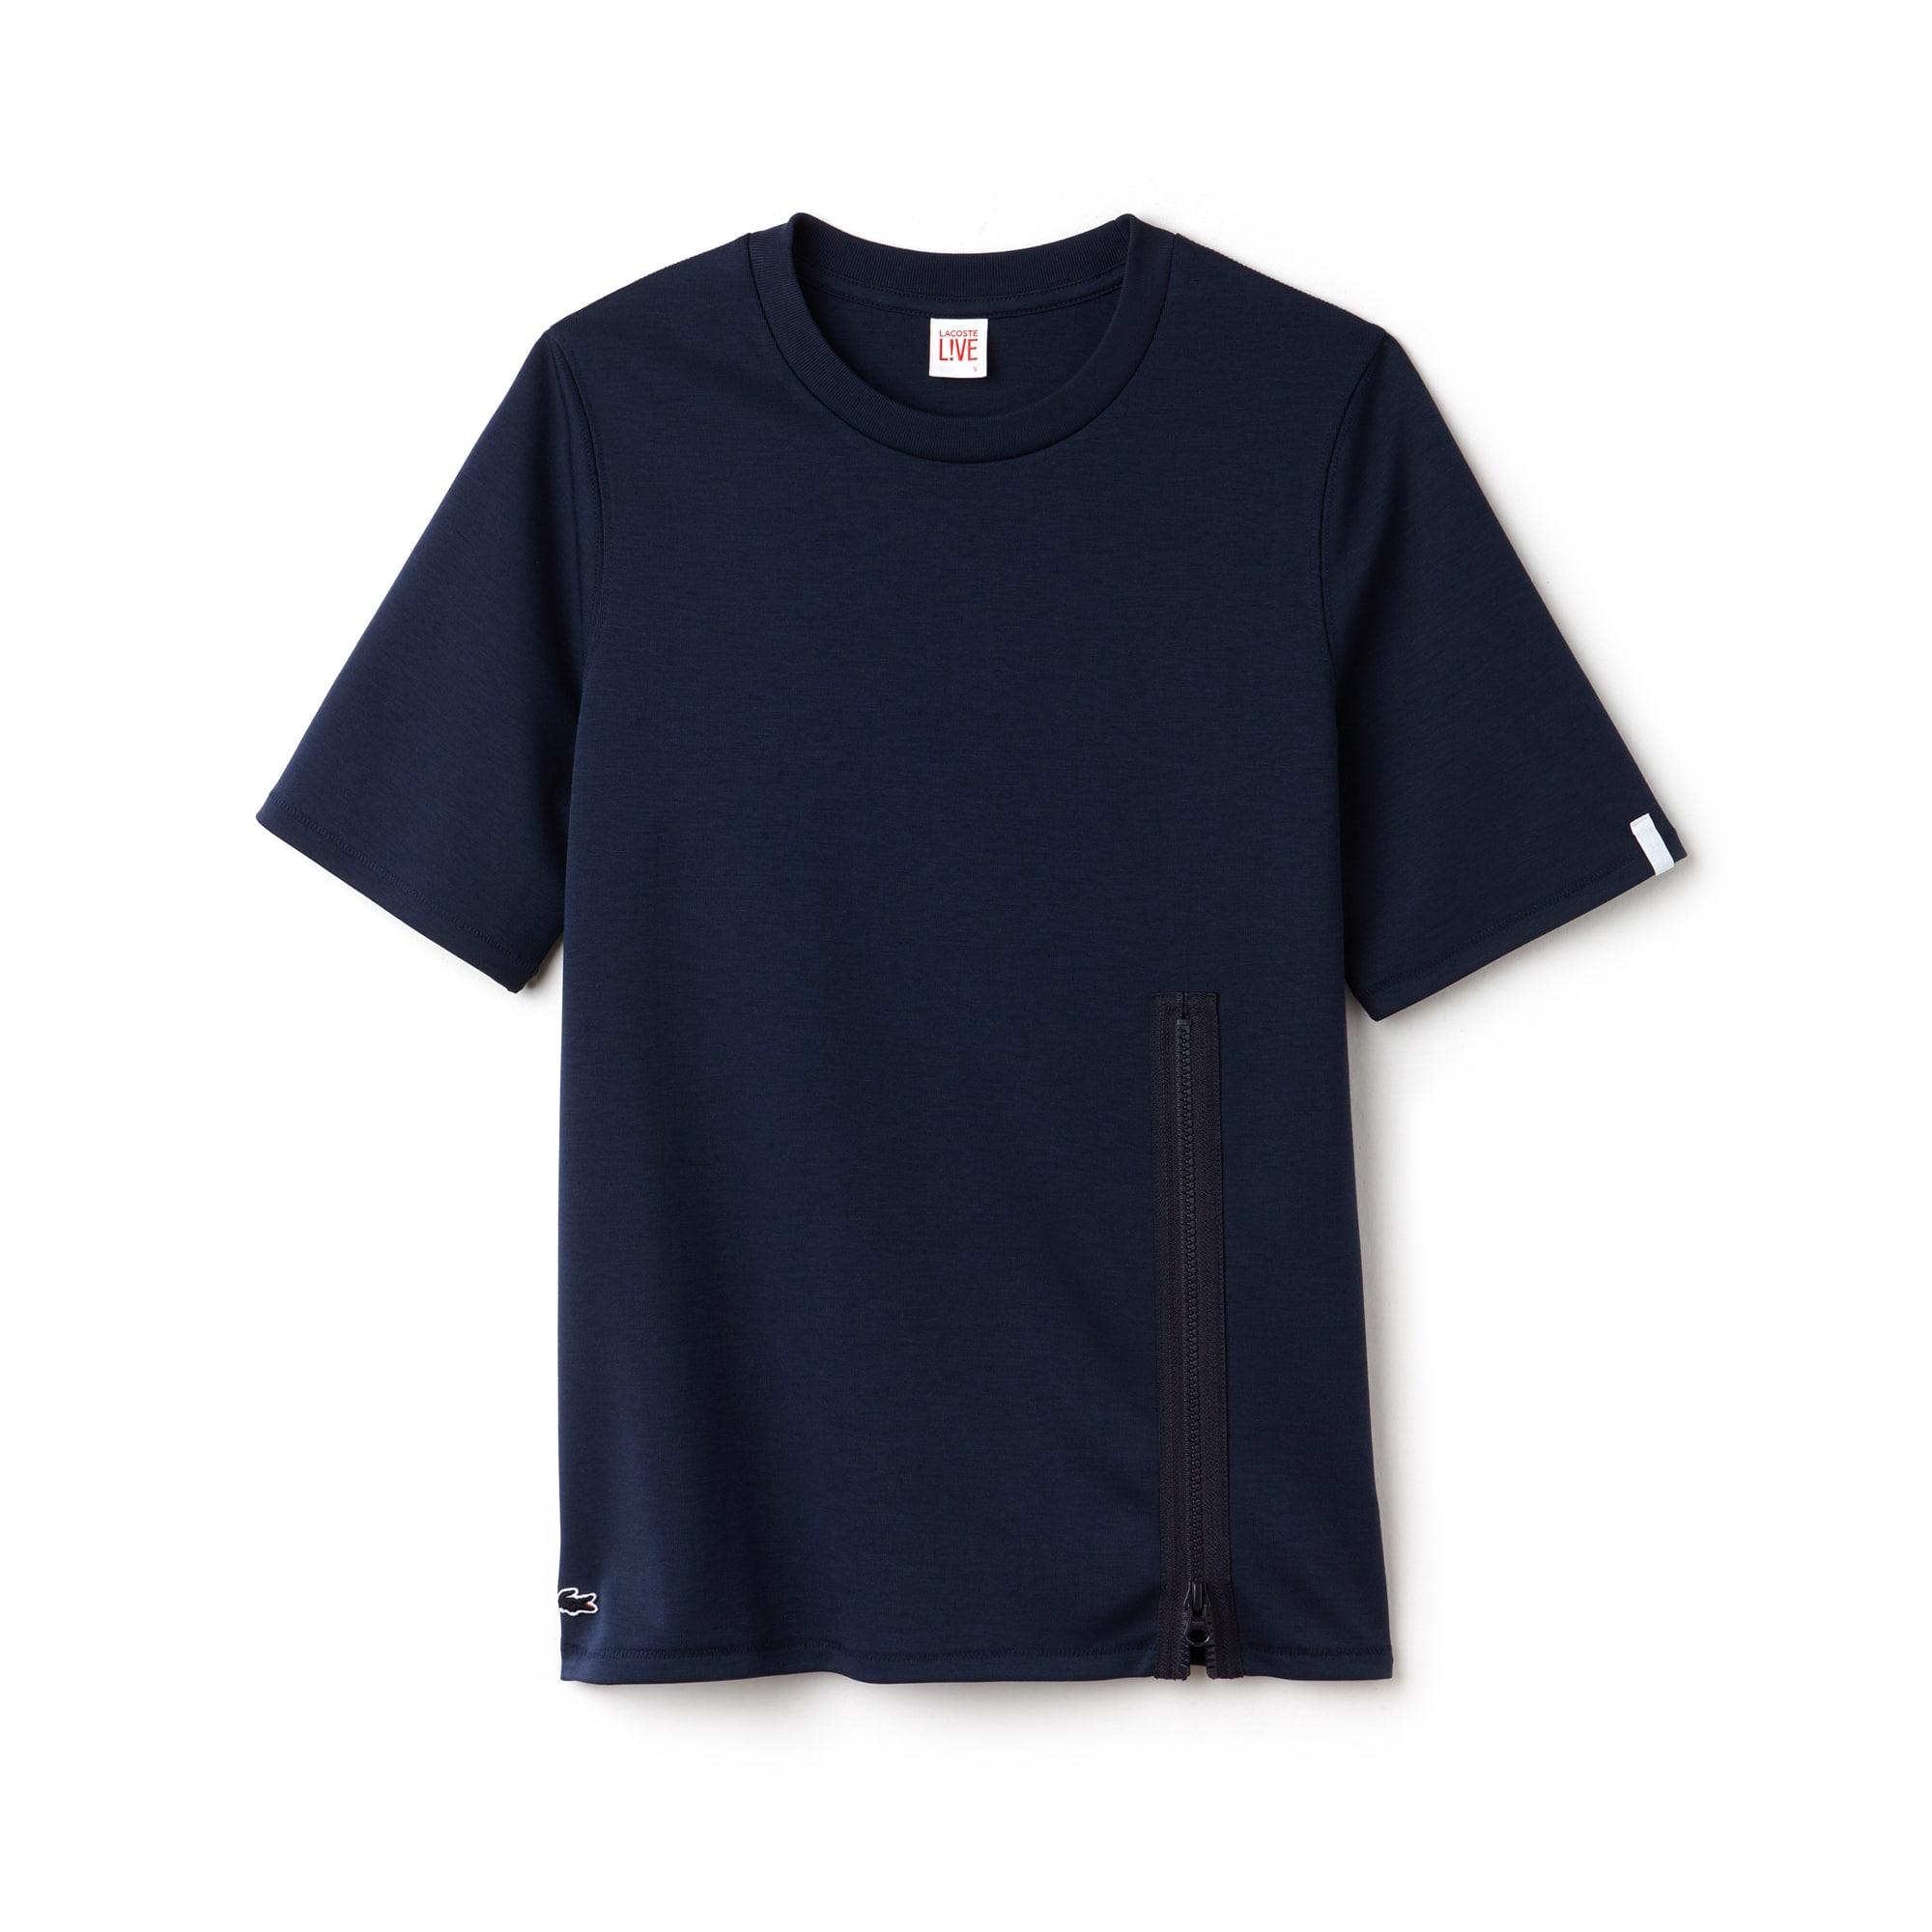 Lacoste LIVE-T-shirt dames ronde hals jersey met rits